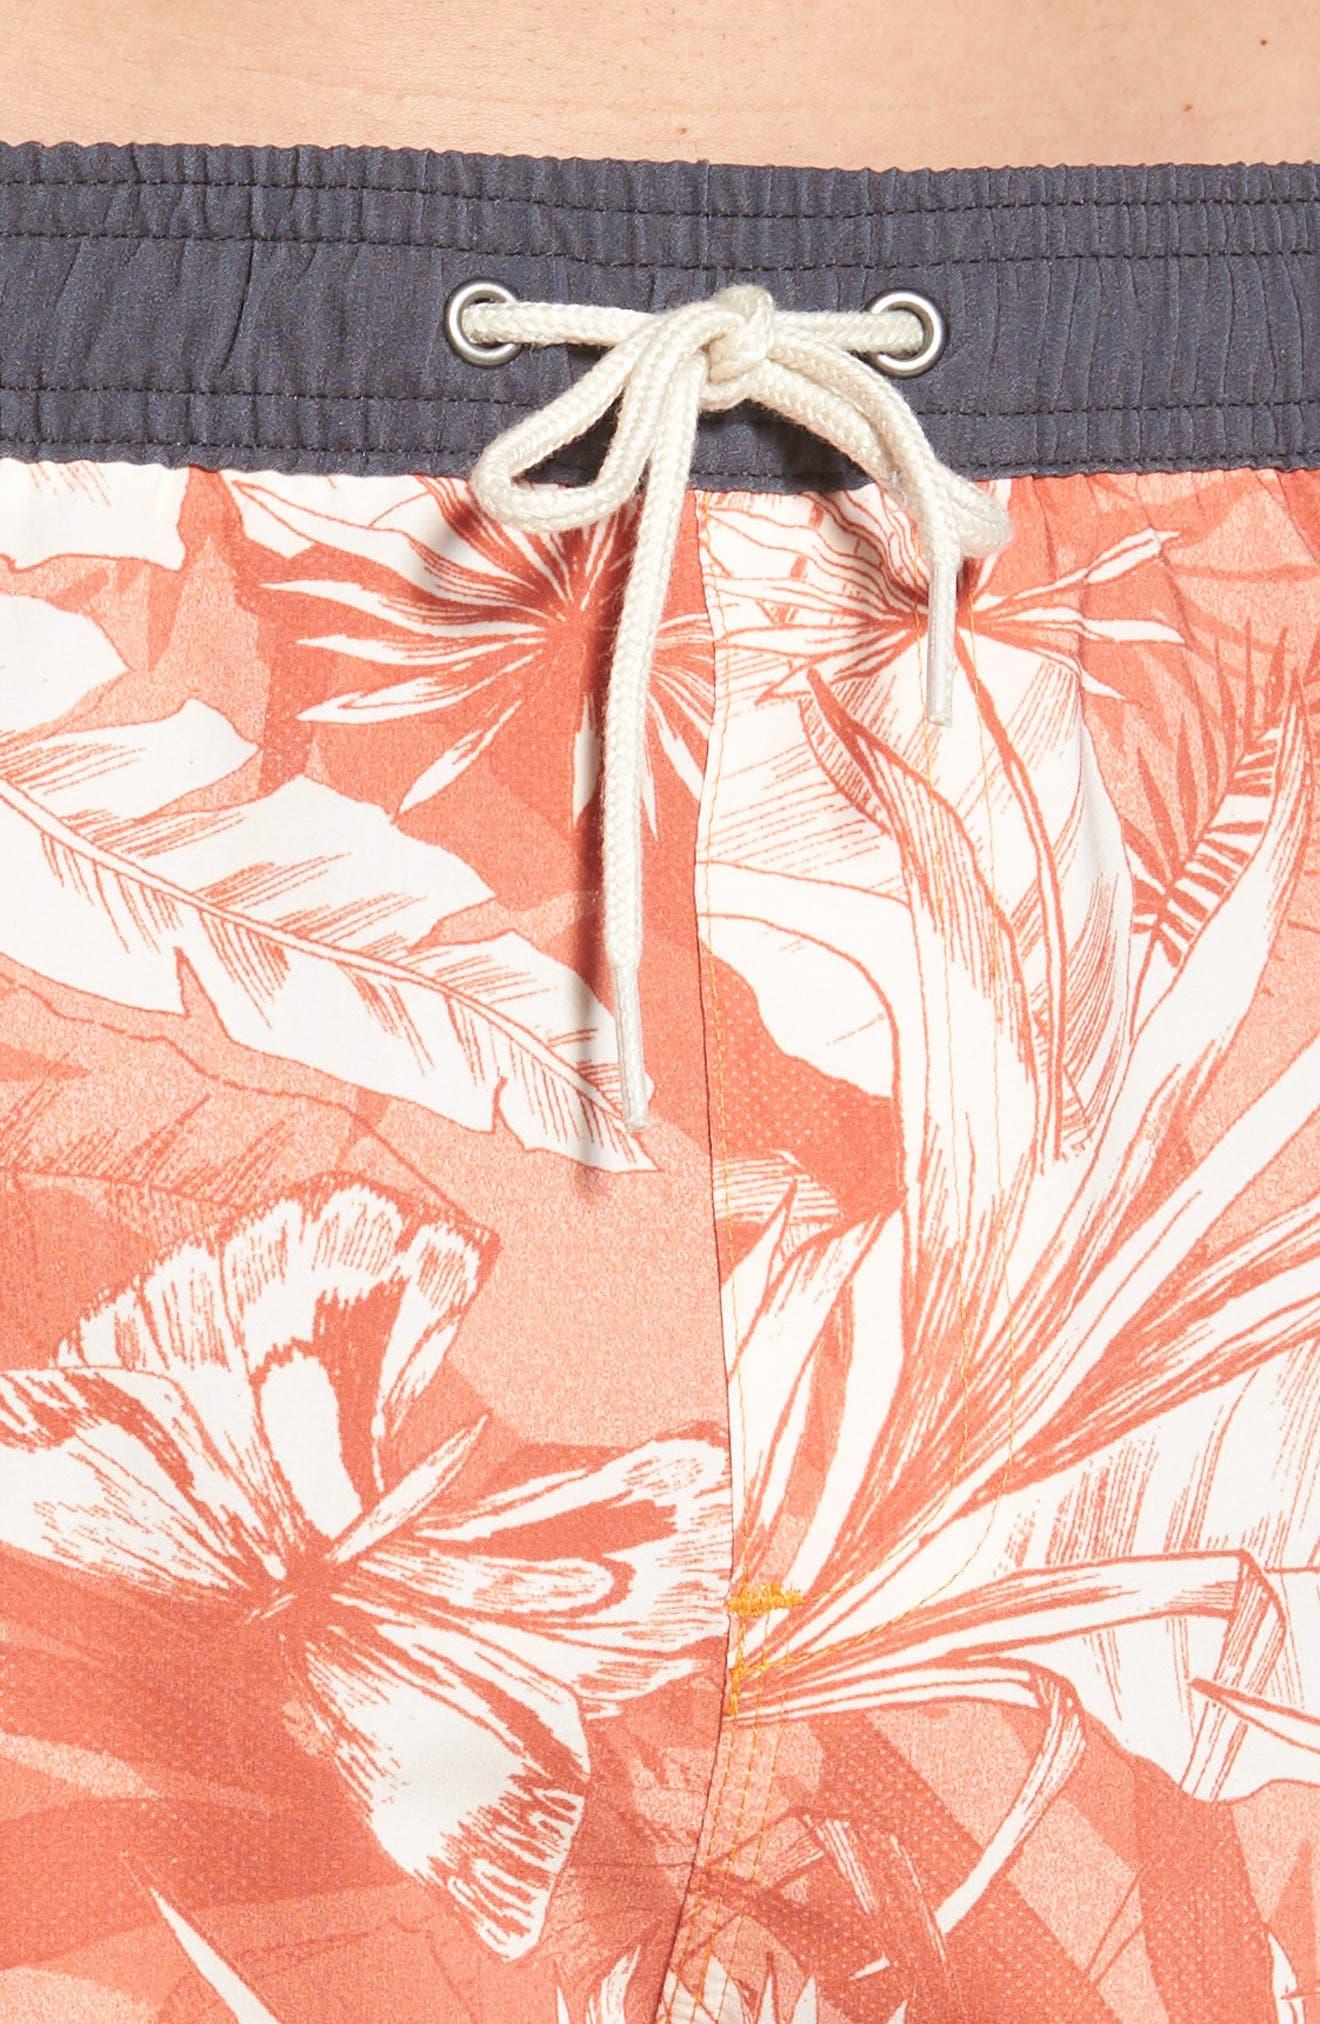 Sunset Board Shorts,                             Alternate thumbnail 4, color,                             214